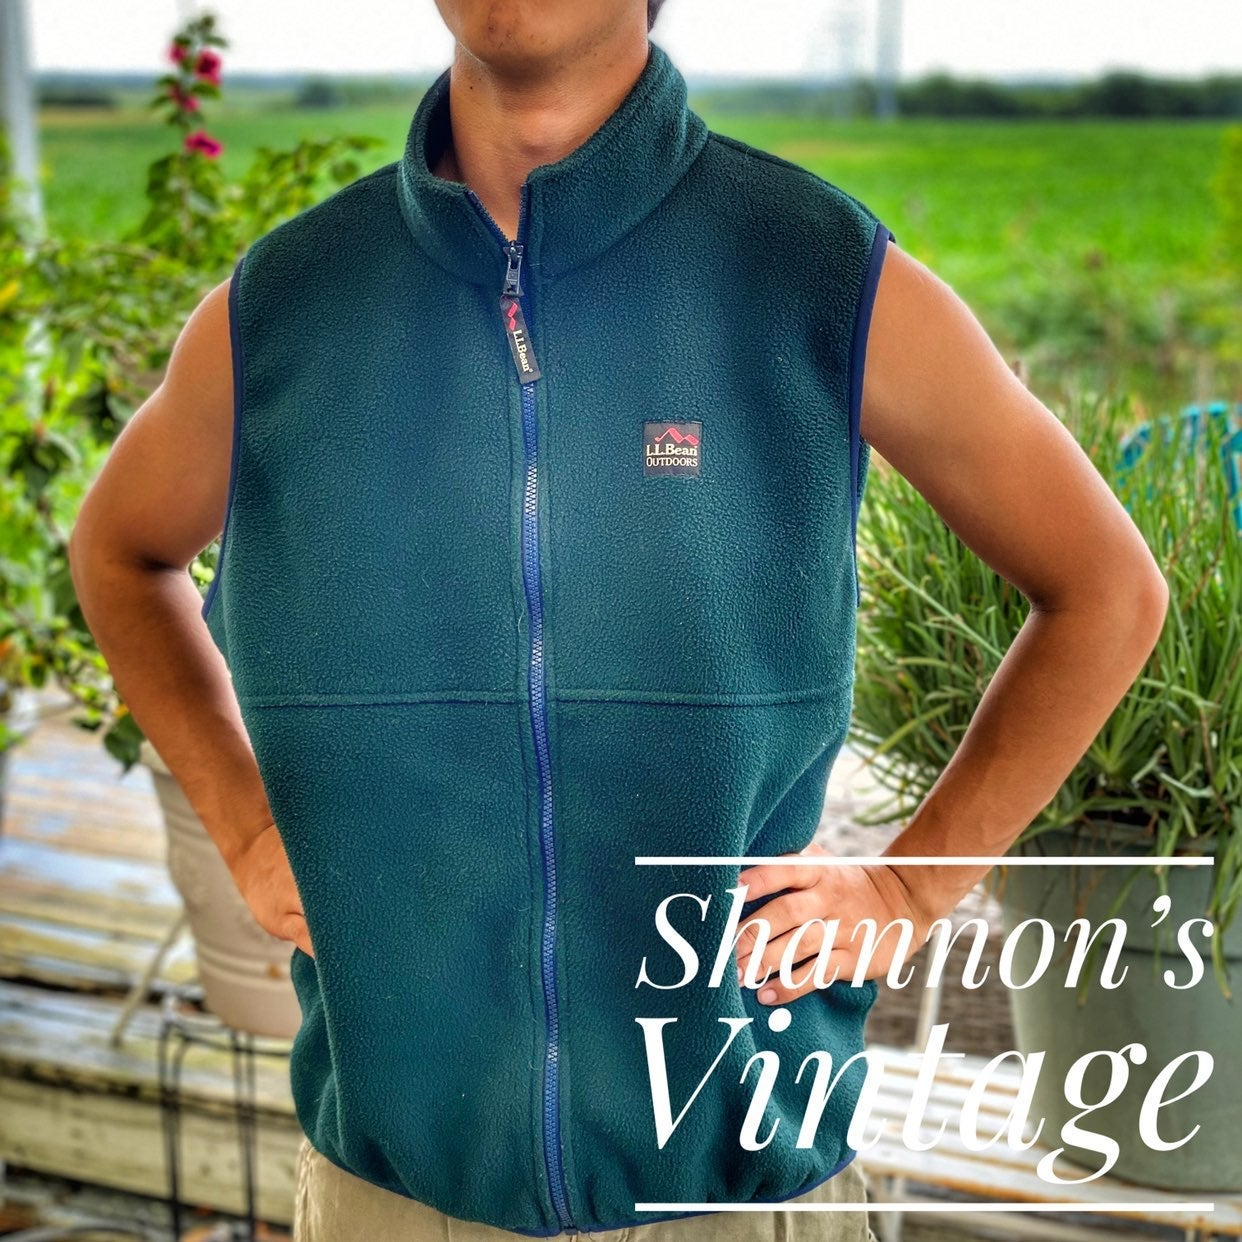 LL Bean Outdoors large fleece vest